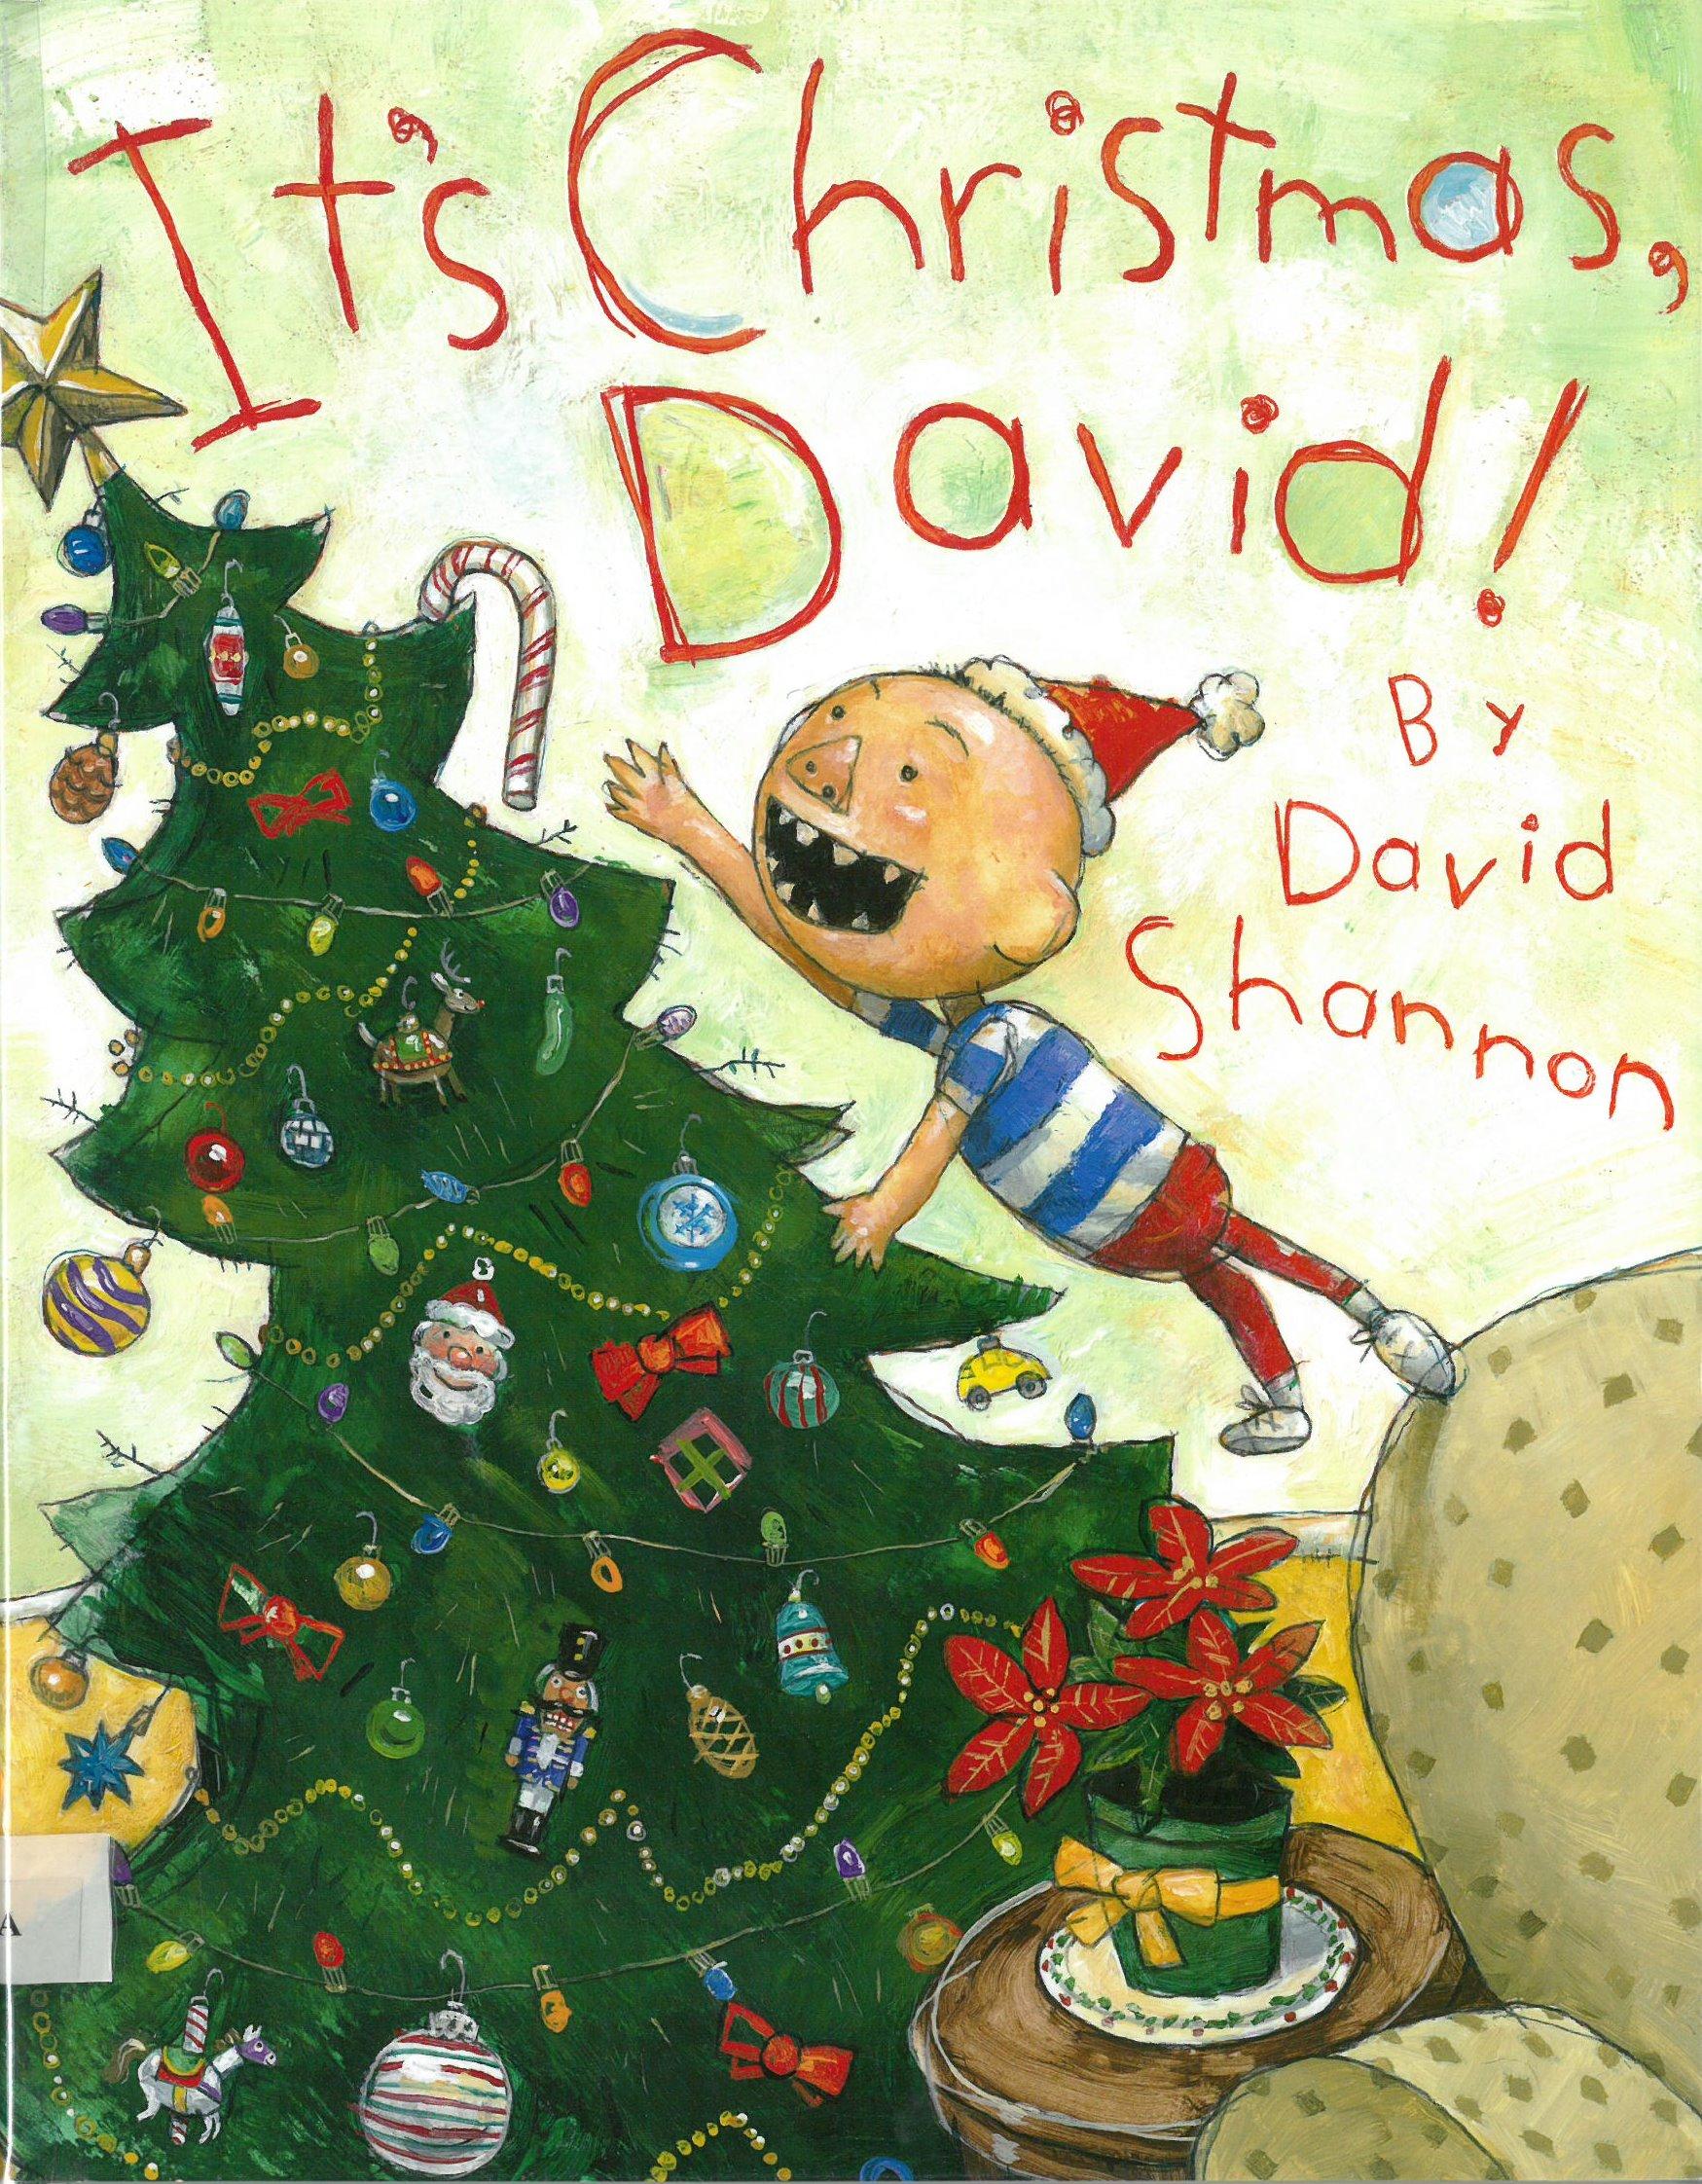 david很顽皮,但也很可爱,因为我们在他身上或多或少都会看到自己的